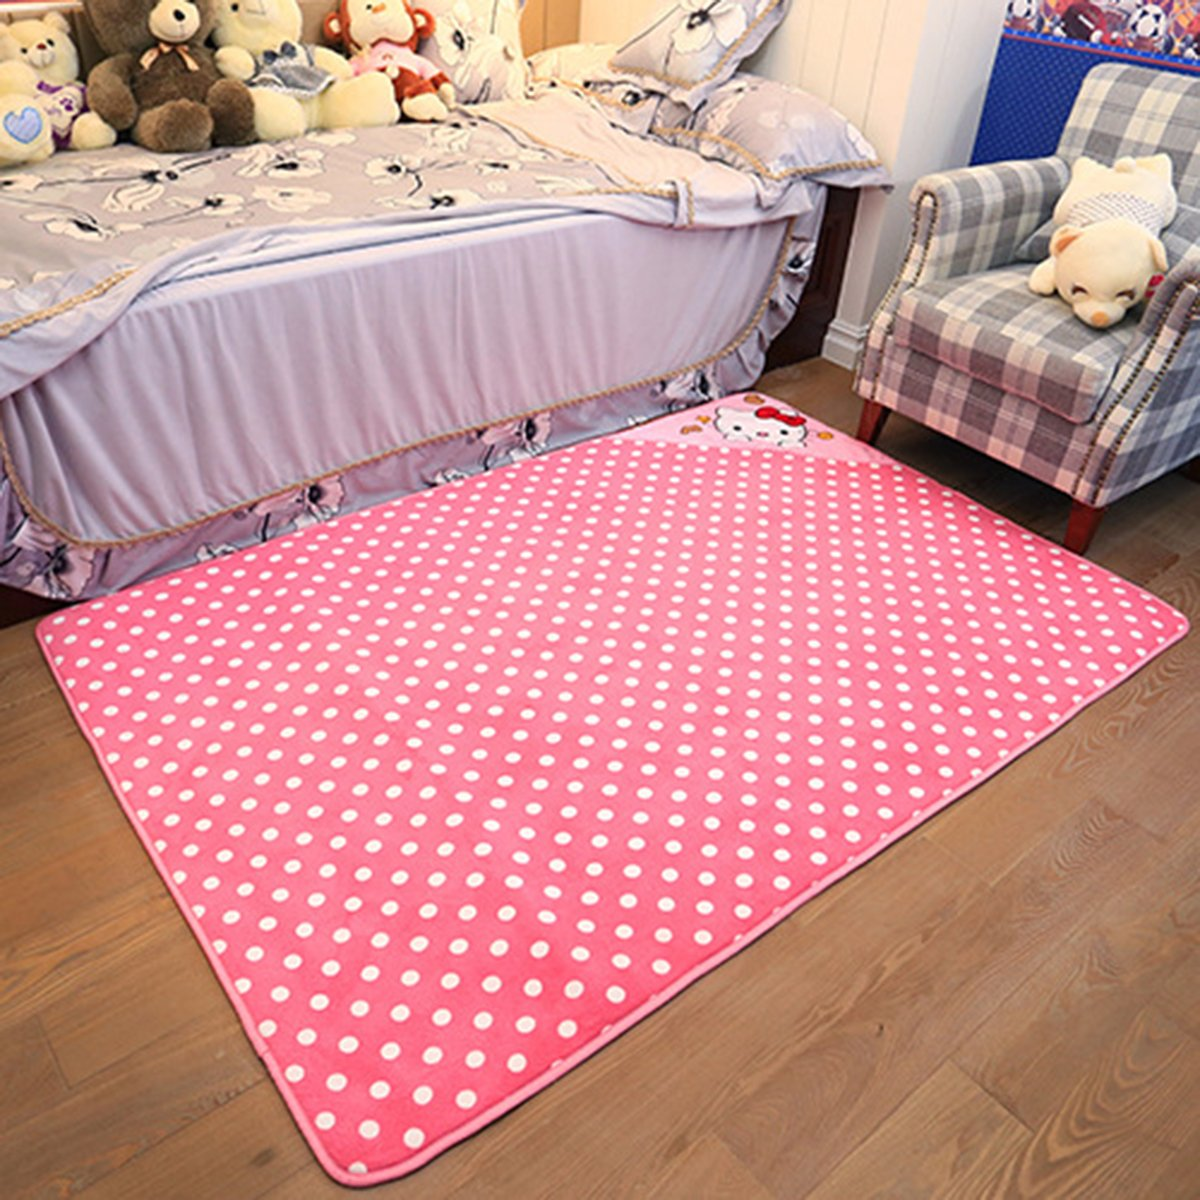 EKEA-Home Cartoon Hello Kitty Skid-proof Washable Carpet Kids Nursery Entertainment Floor Area Rugs Baby Crawling Mat For Living Room/Bed Room Pink,90x190cm/35.46''x74.86''